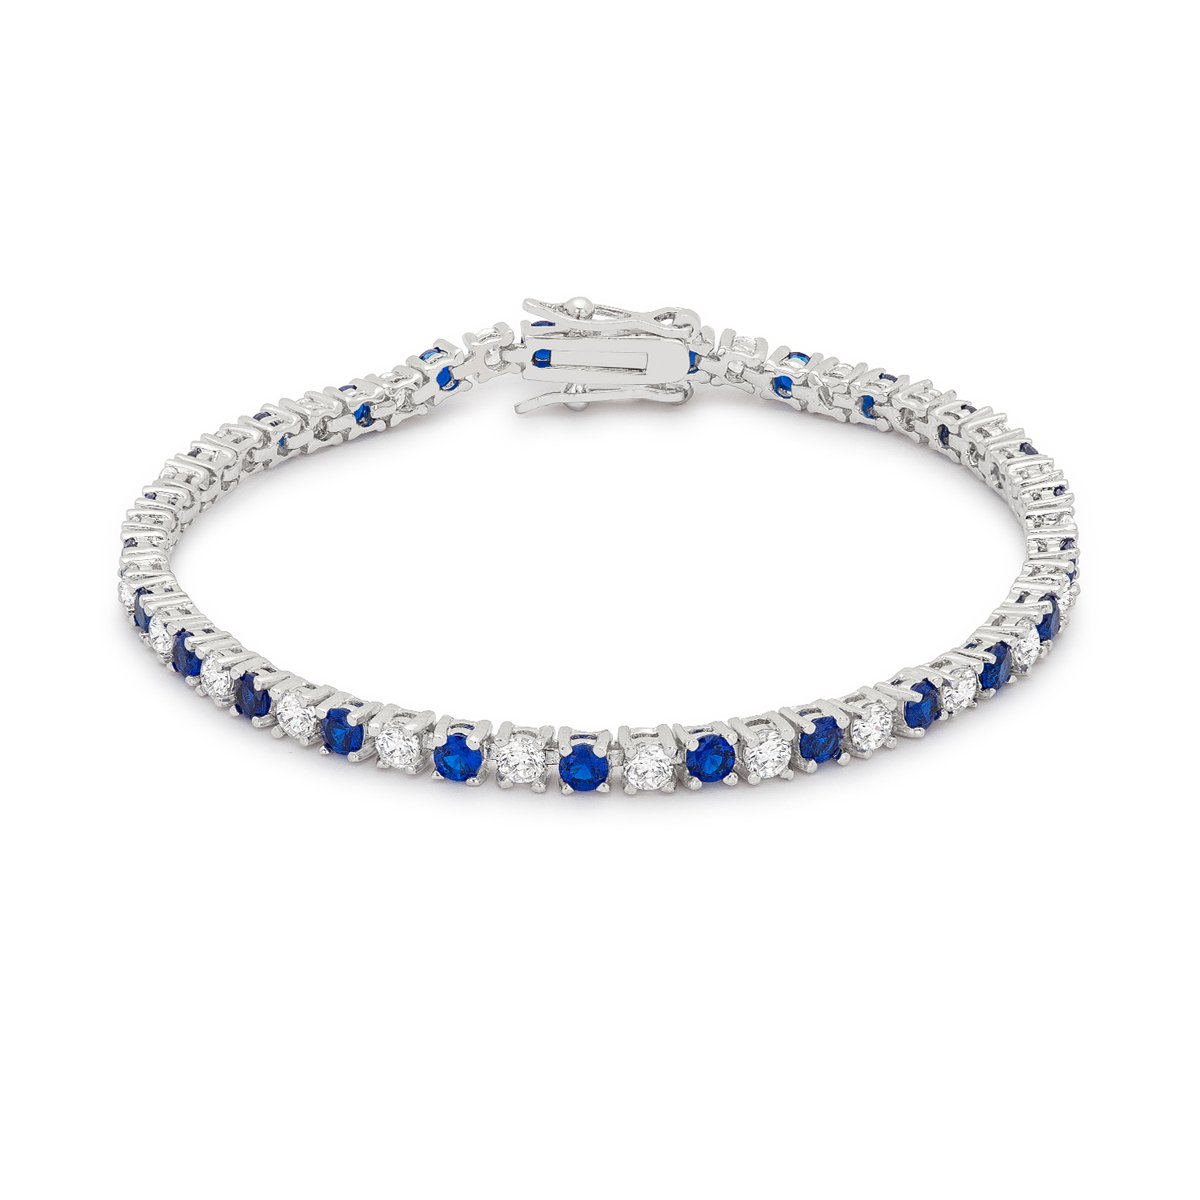 Sapphire Blue Cubic Zirconia Tennis Bracelet By Kate Bissett